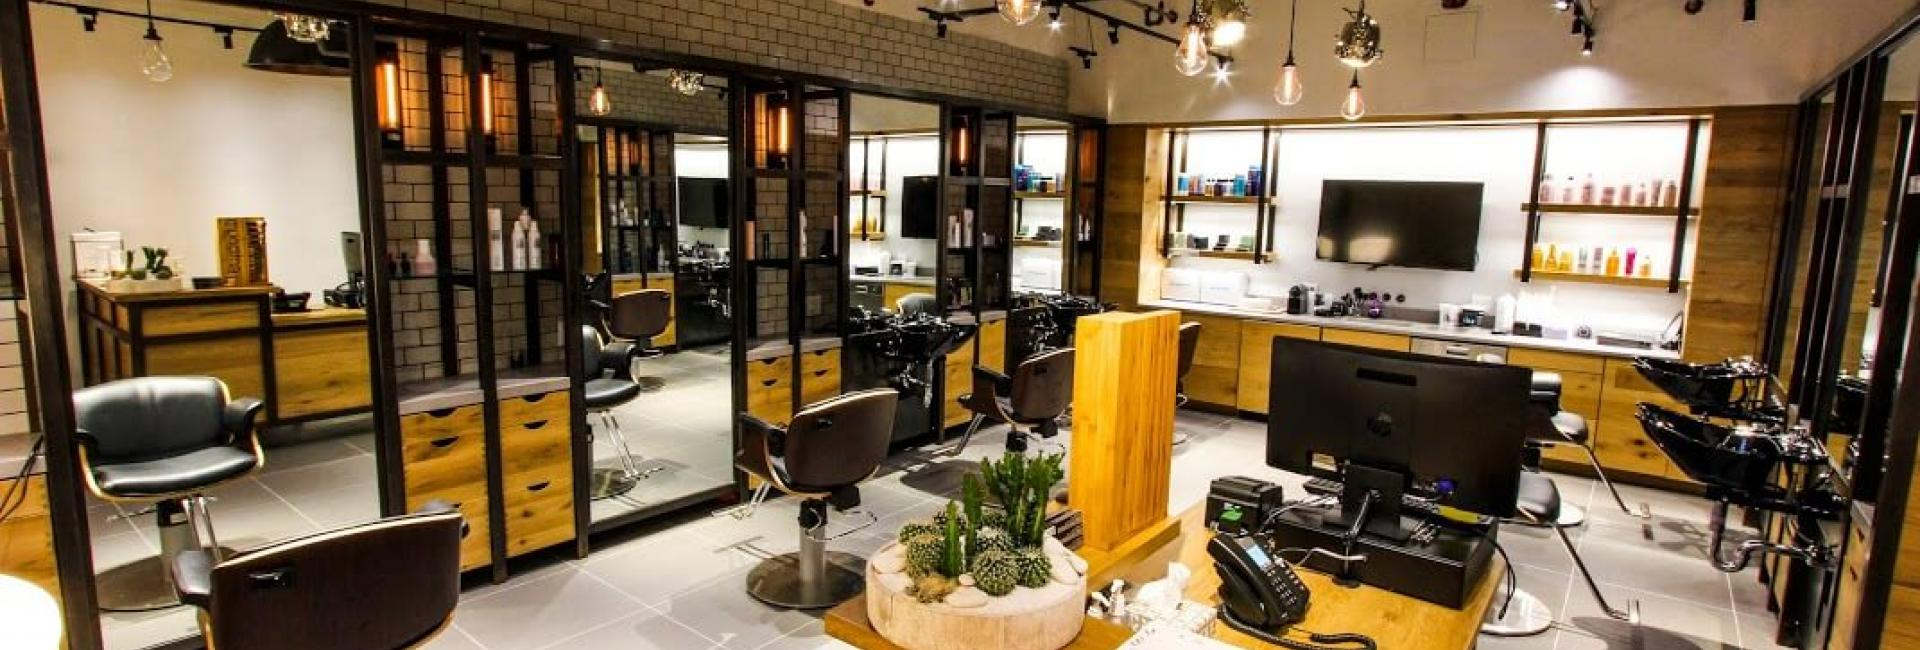 warren-tricomi's-joel-warren-opens-new-salon-concept